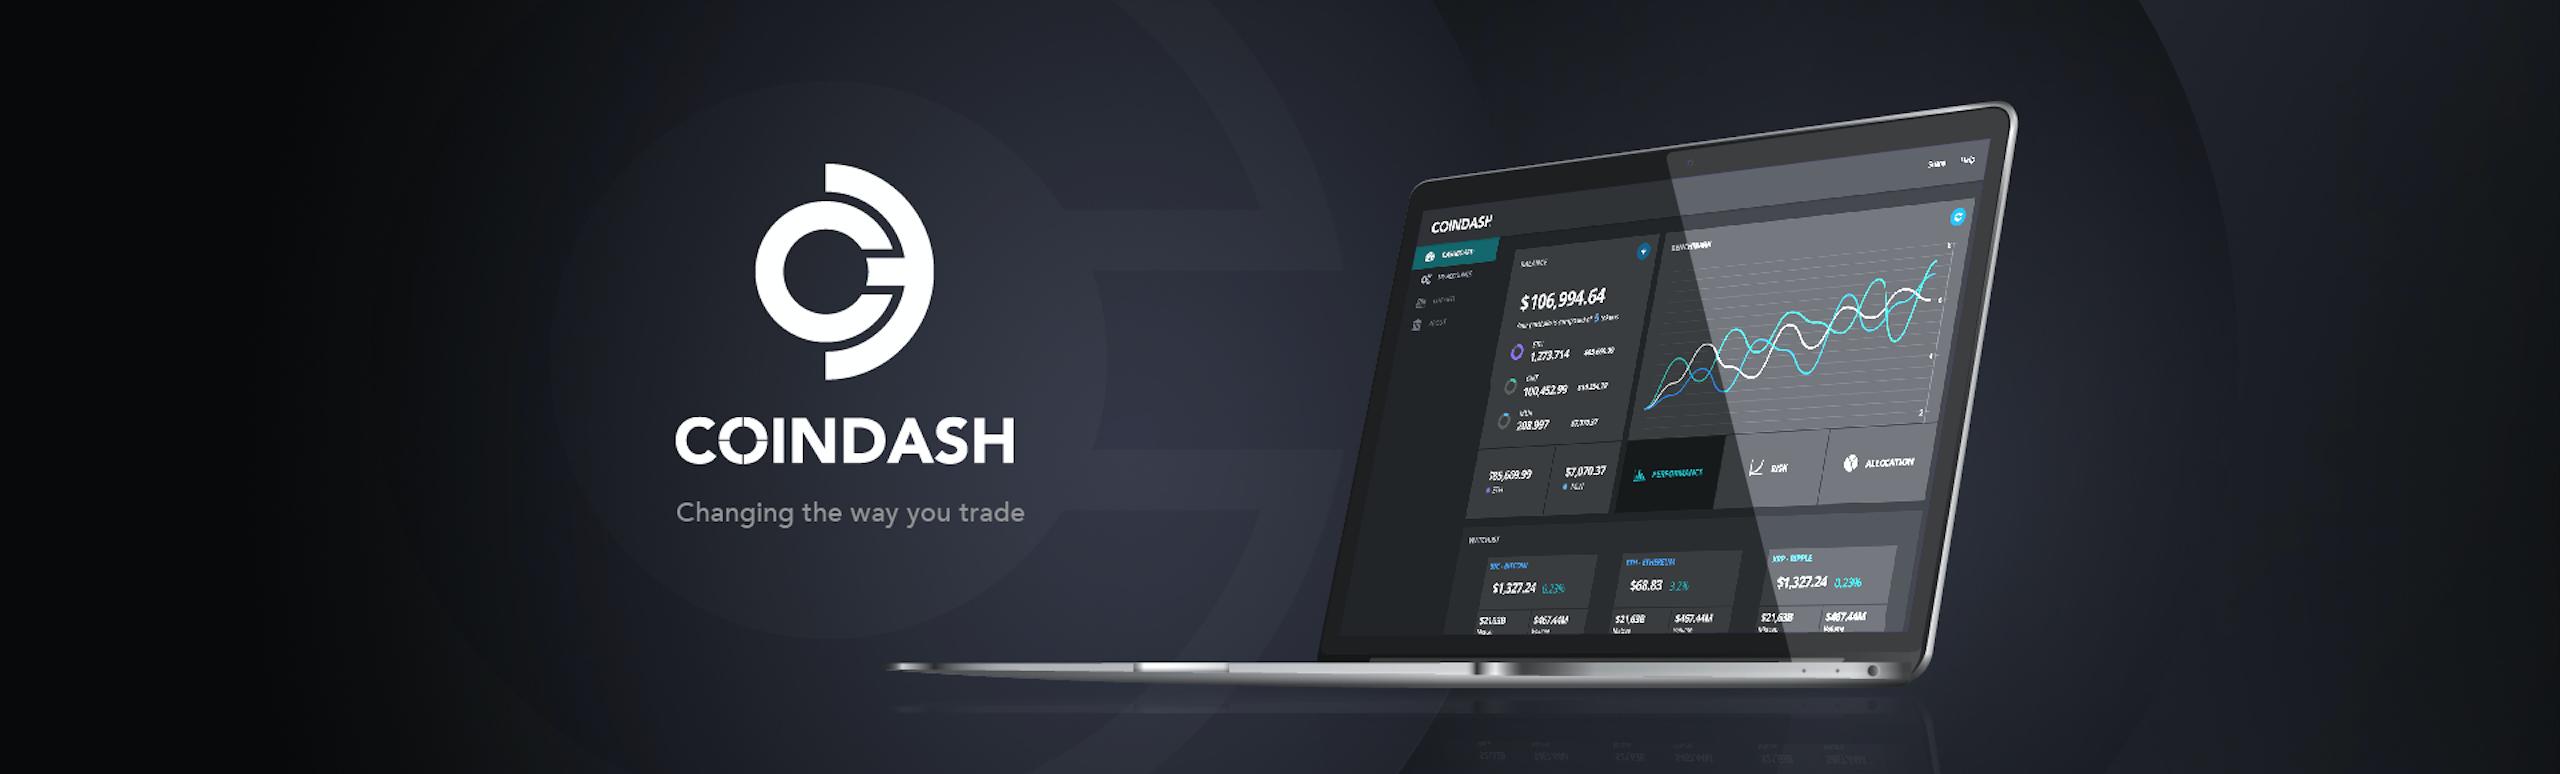 CoinDash ICO - Etoro alike platform